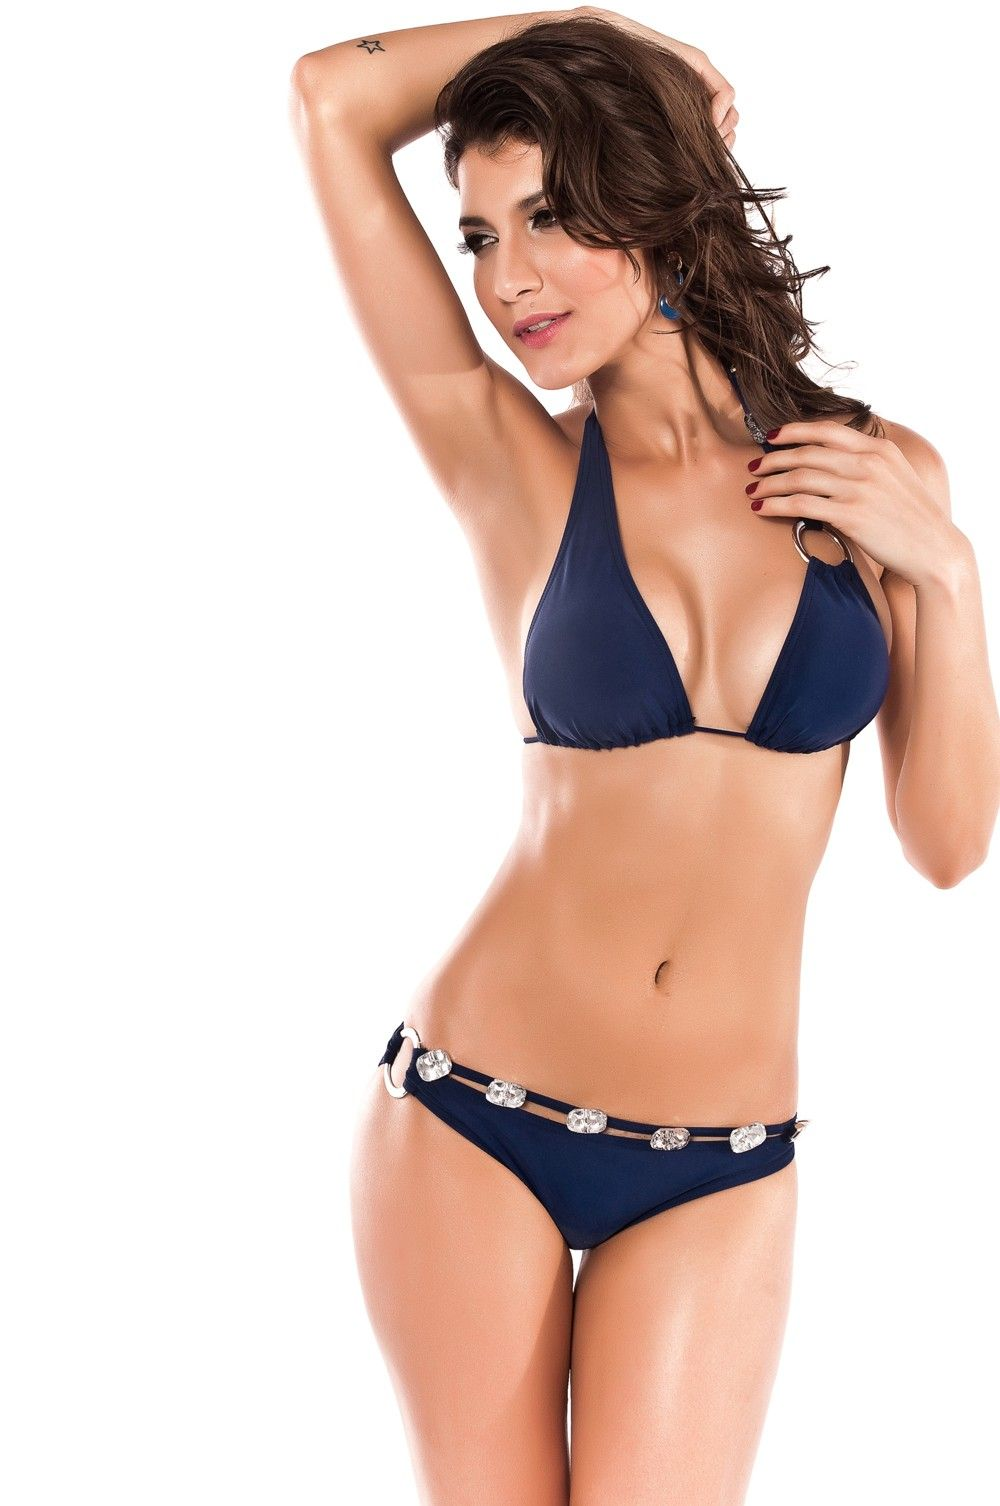 378c77b60a Hot Sexy Nylon Spandex Bikini Set Bra Swimsuit Dark Blue Metal Chain  Decoration Swimwear  13.42